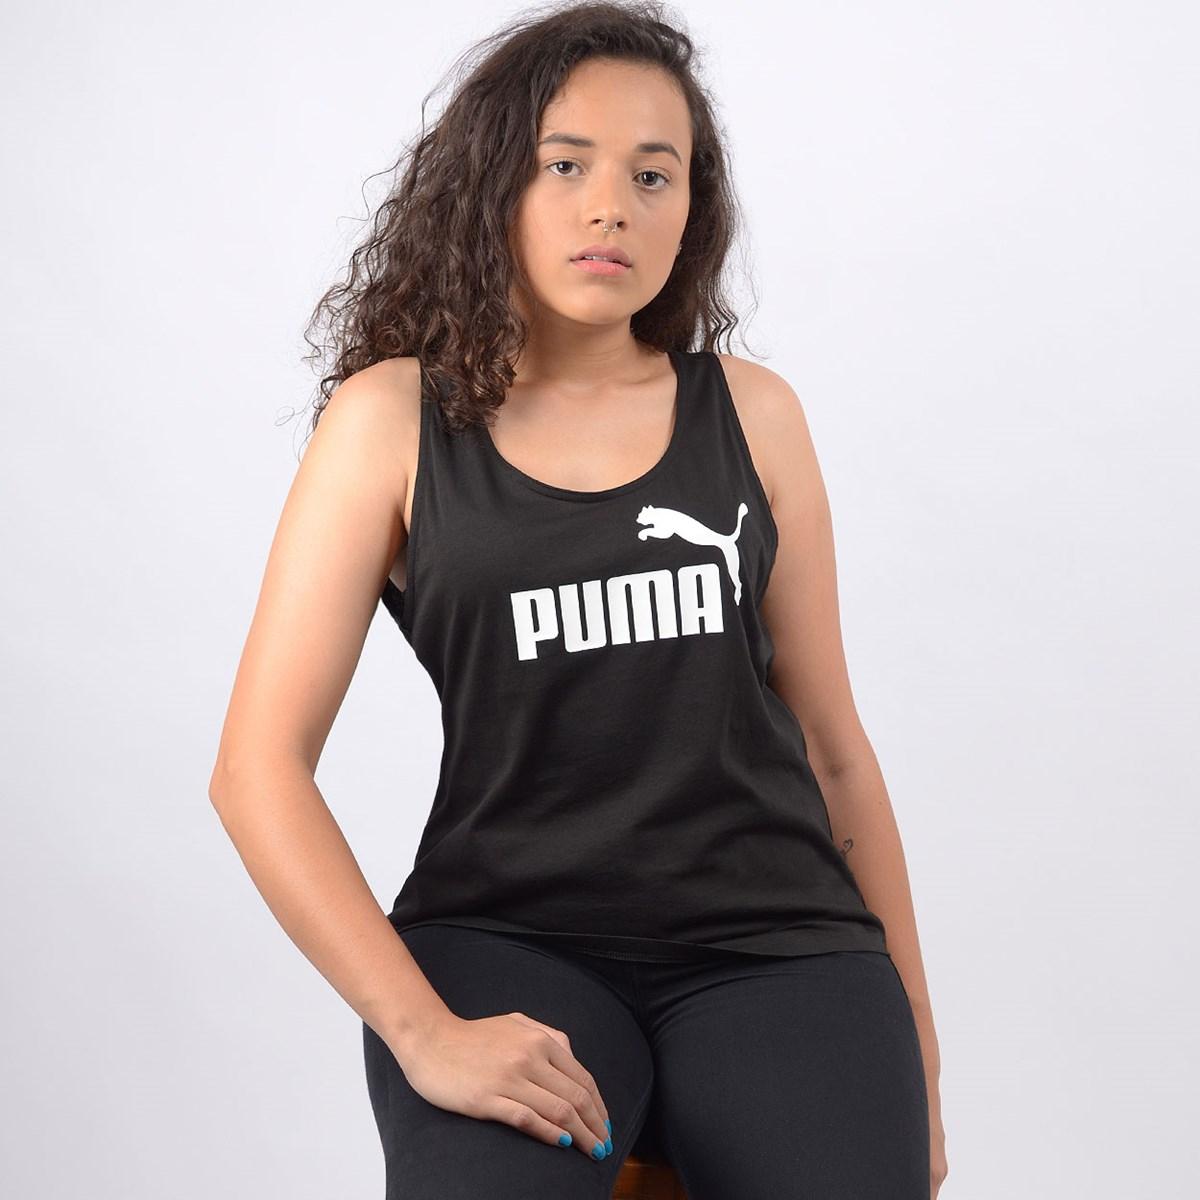 Regata Puma Feminina Essentials Tank Preto 85178501